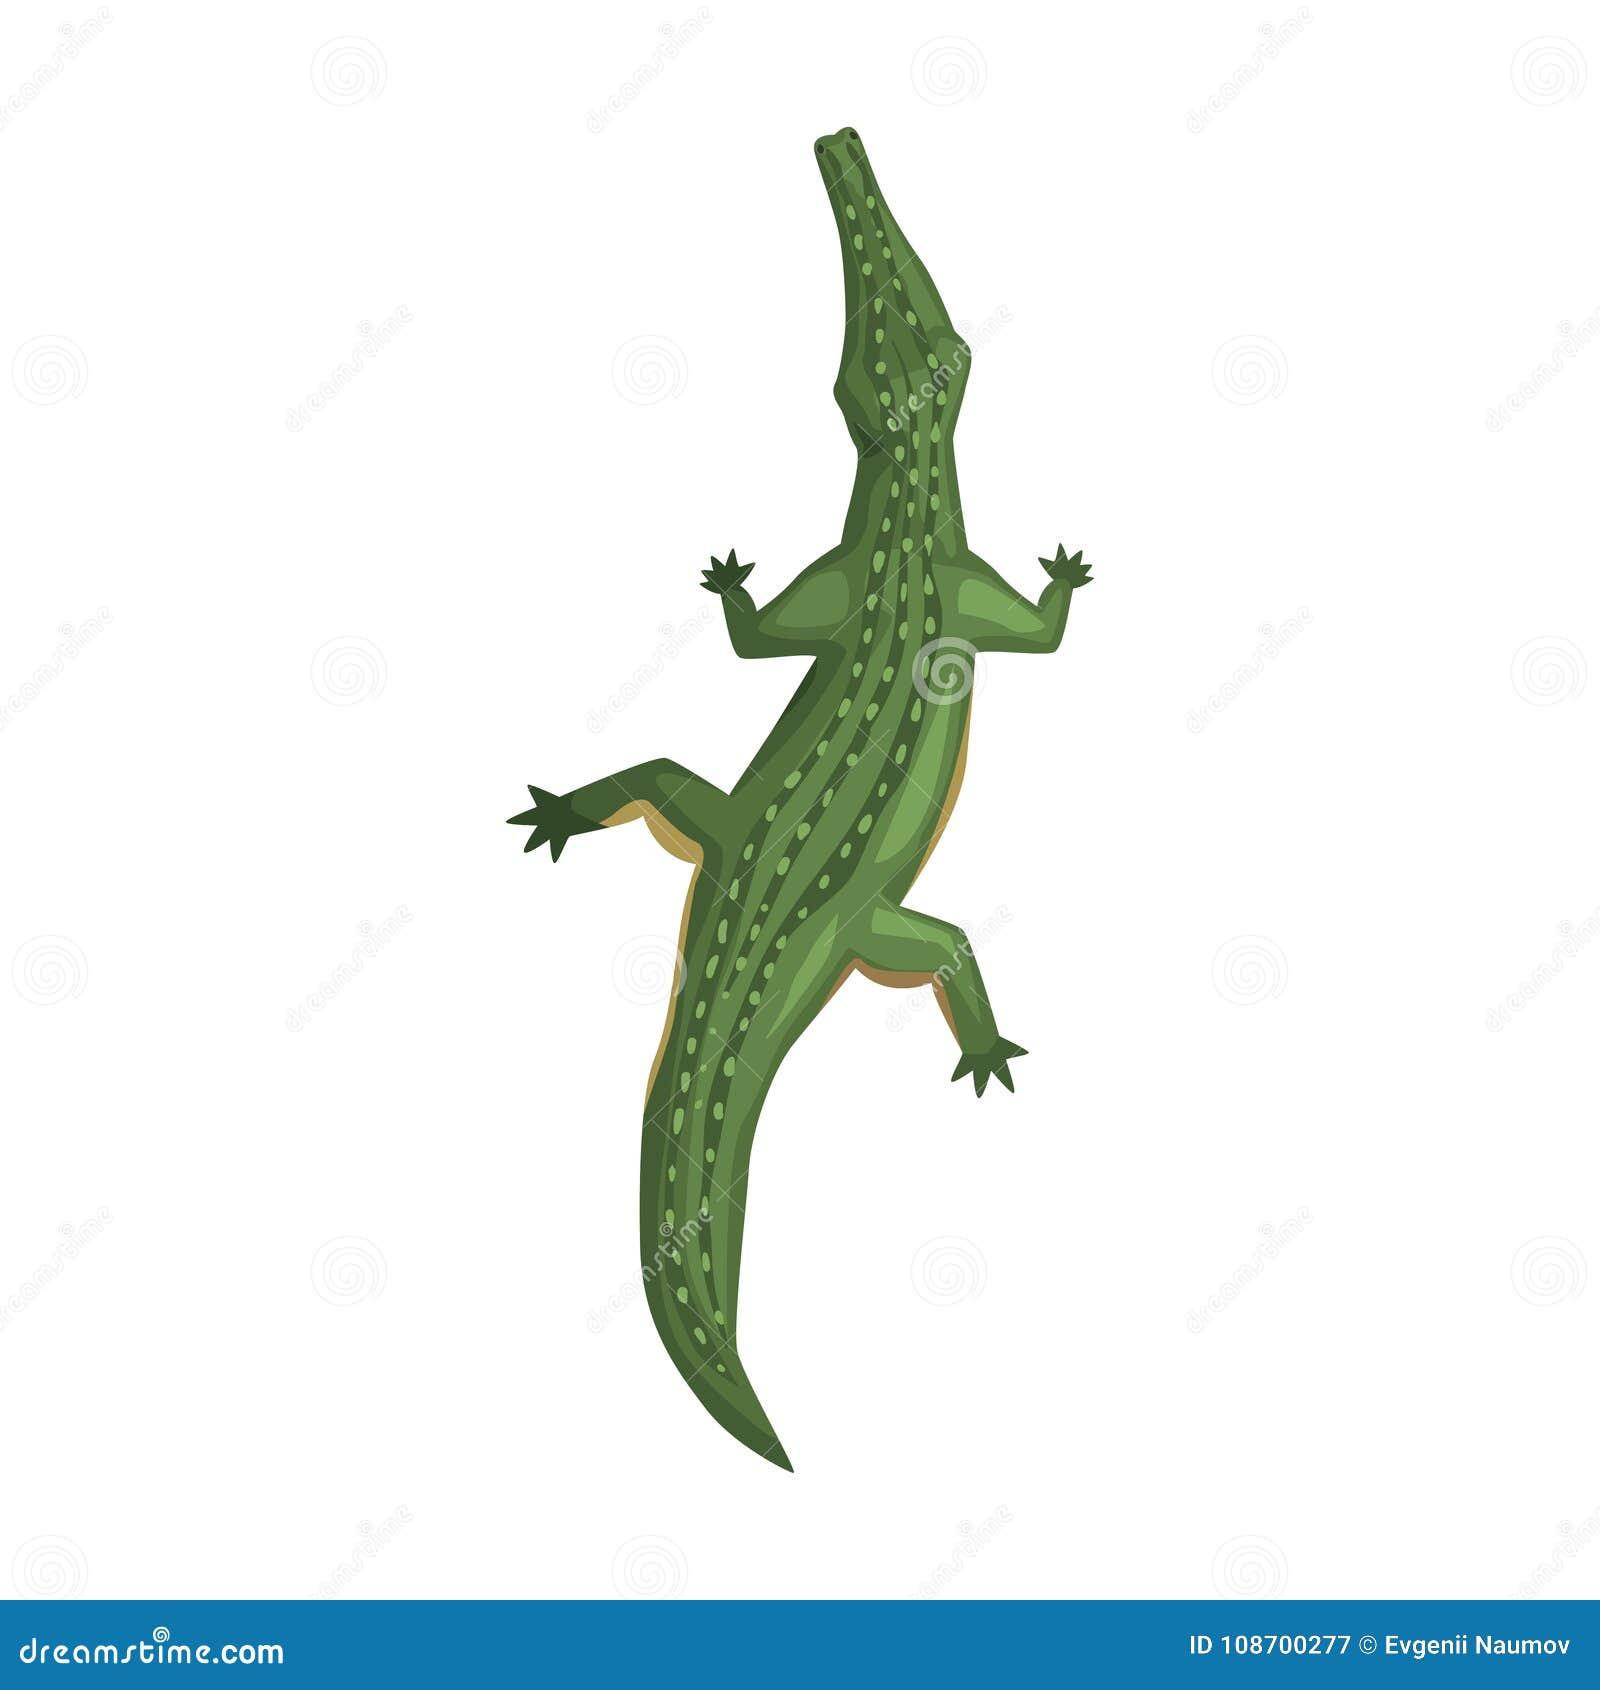 Crocodile, amphibian animal, view from above cartoon vector Illustration